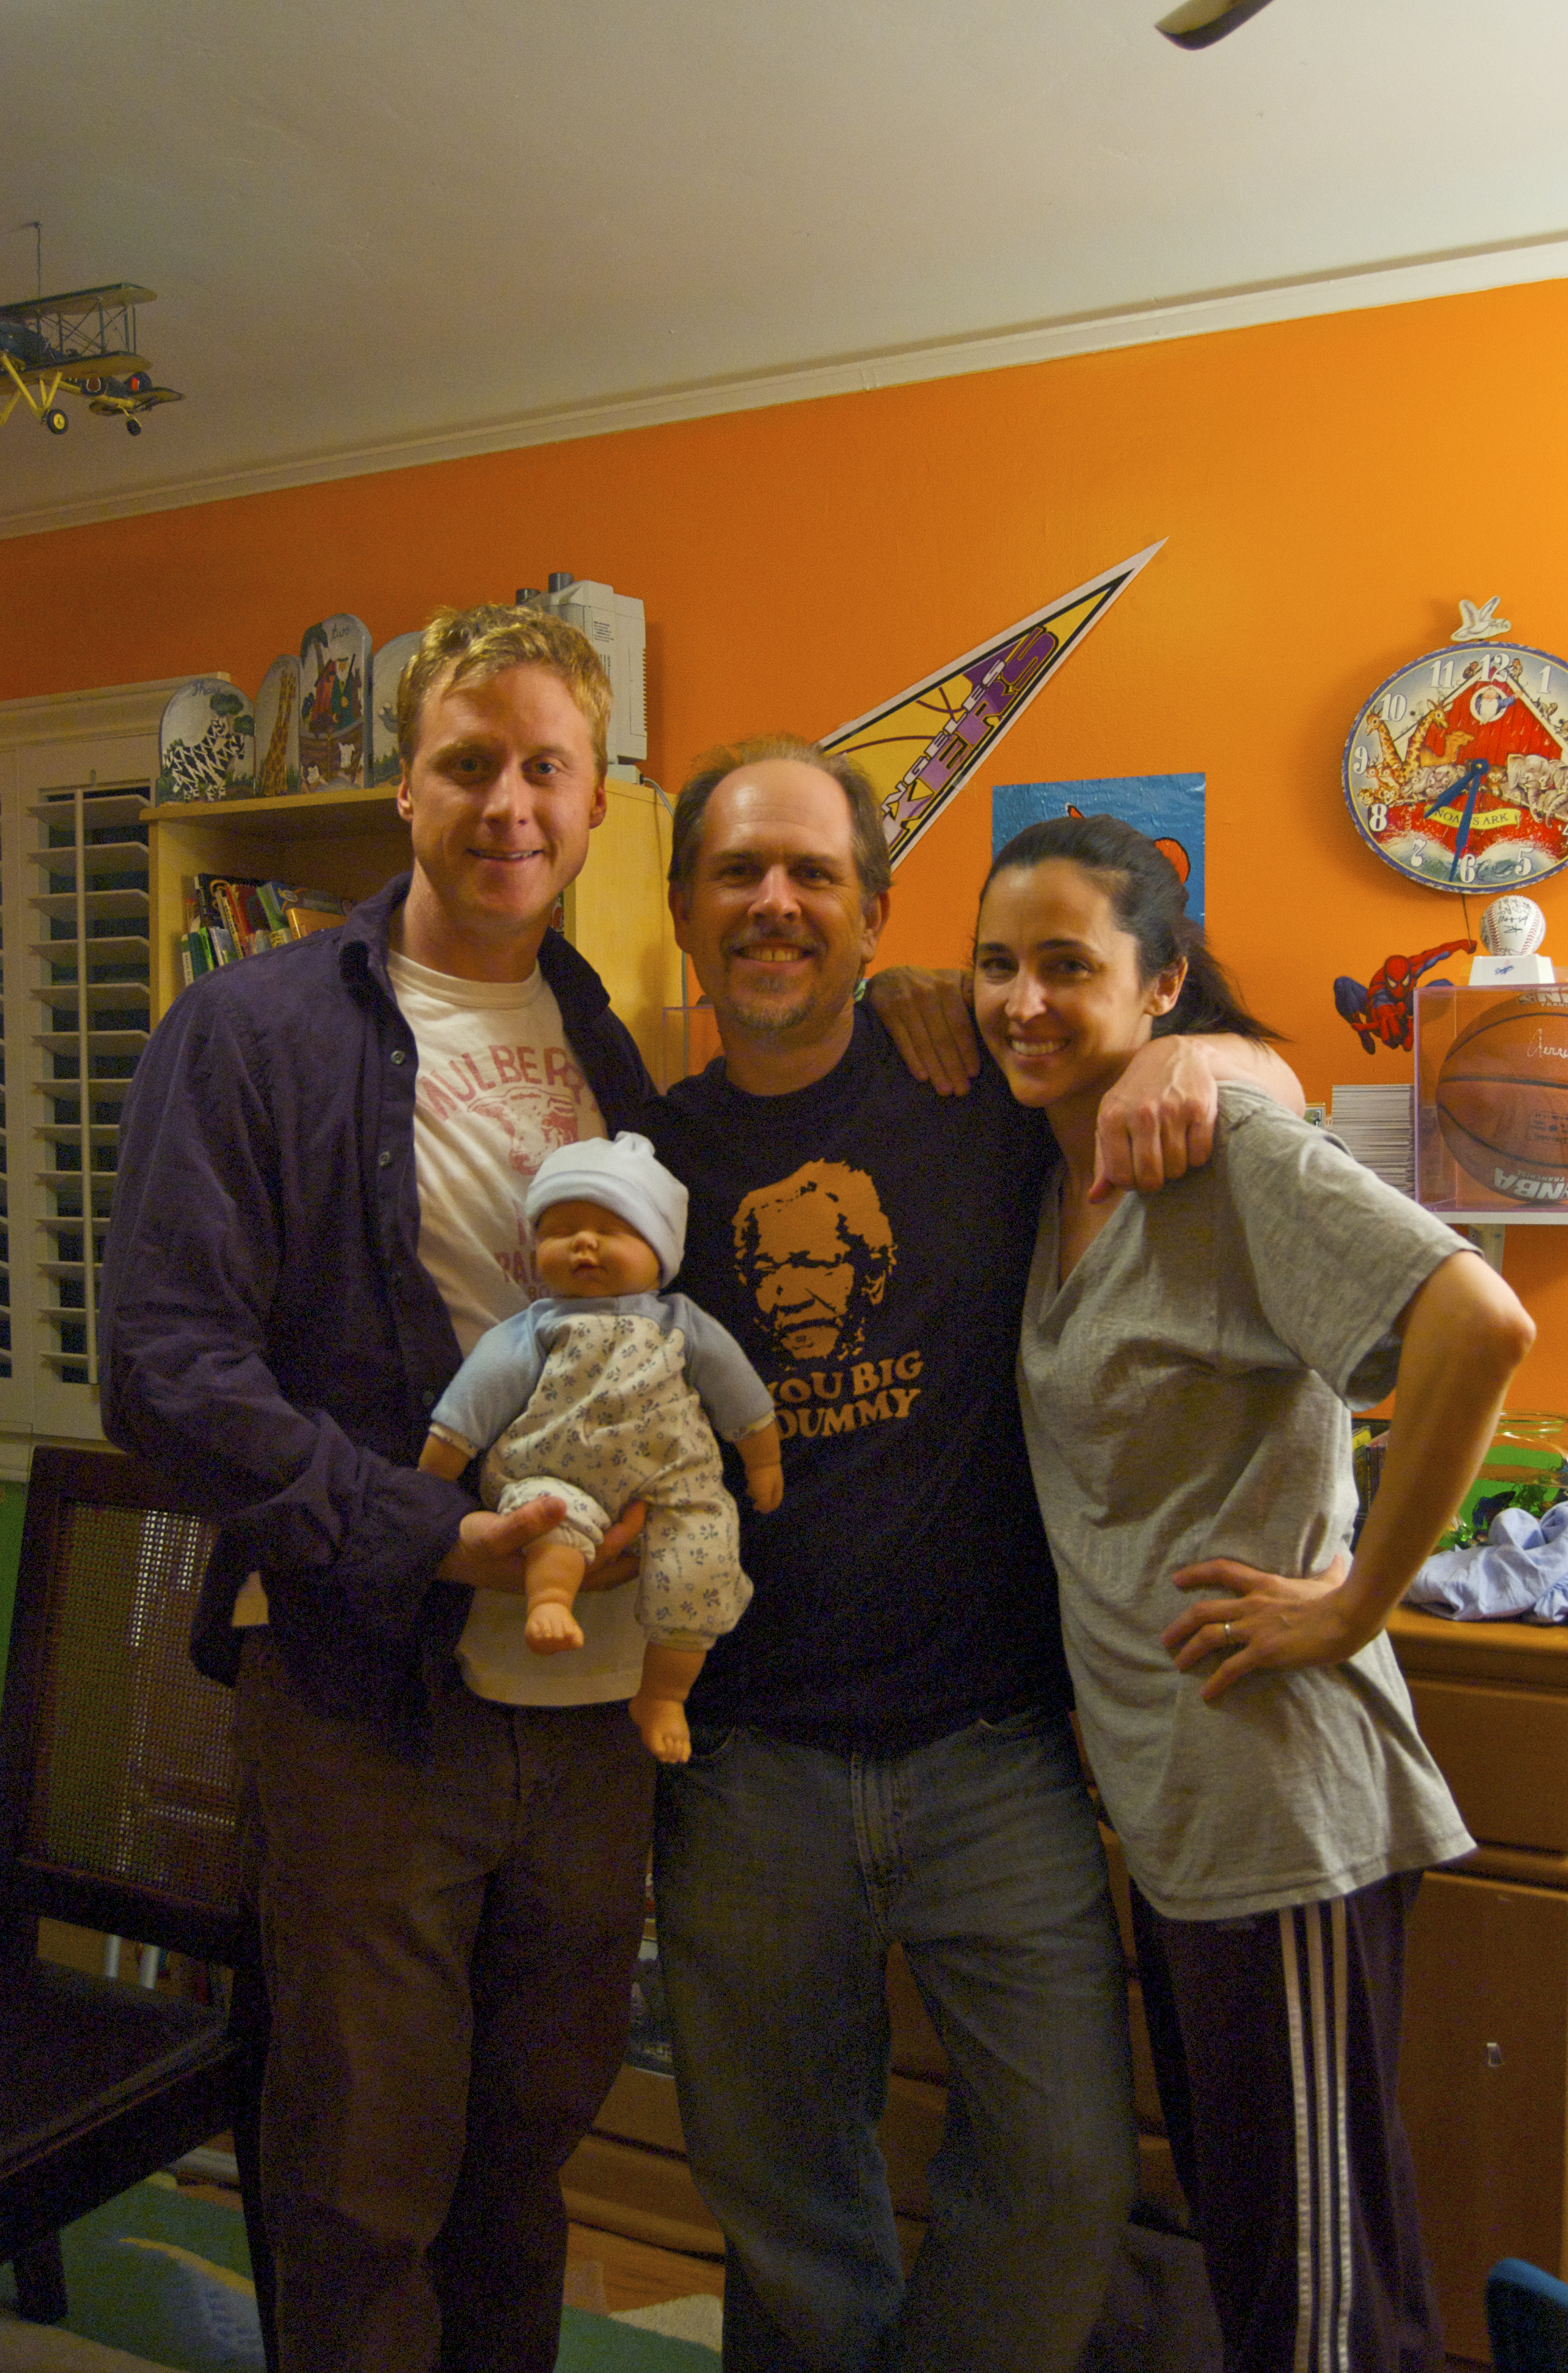 Conception with Alan Tudyk and Jennifer Jostyn